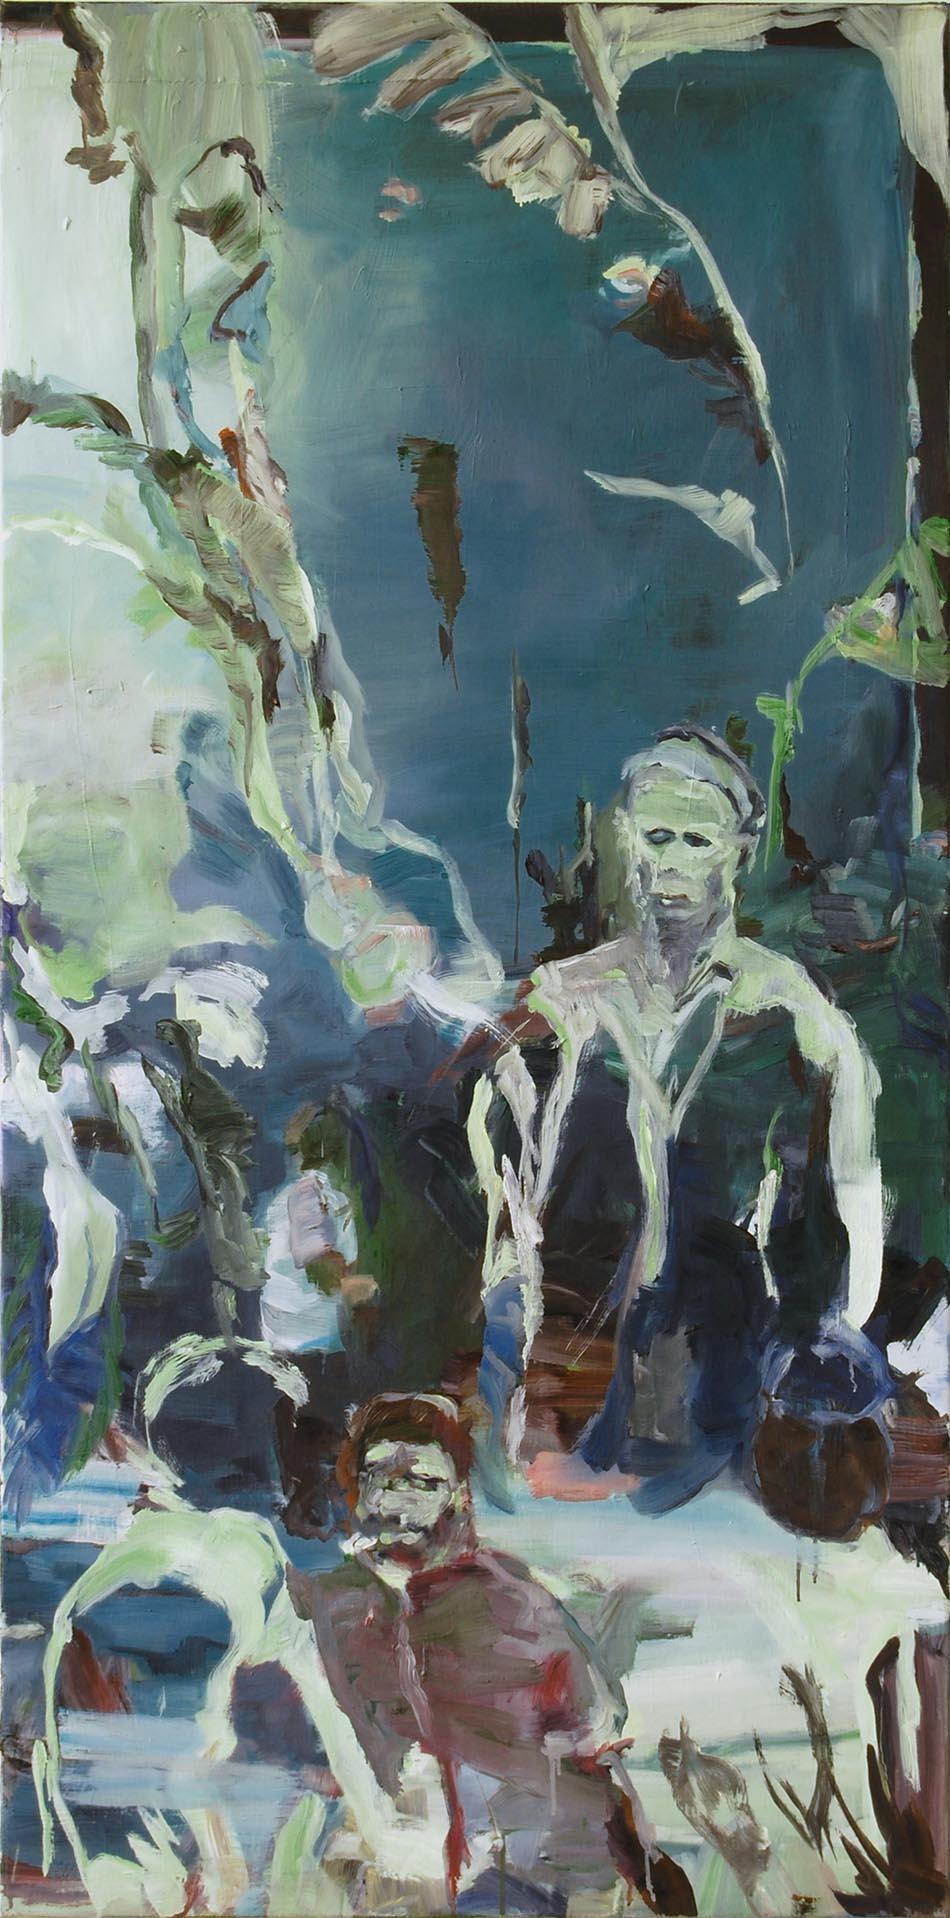 les péchés de nos pères - olieverf schilderij door Bart Vinckier